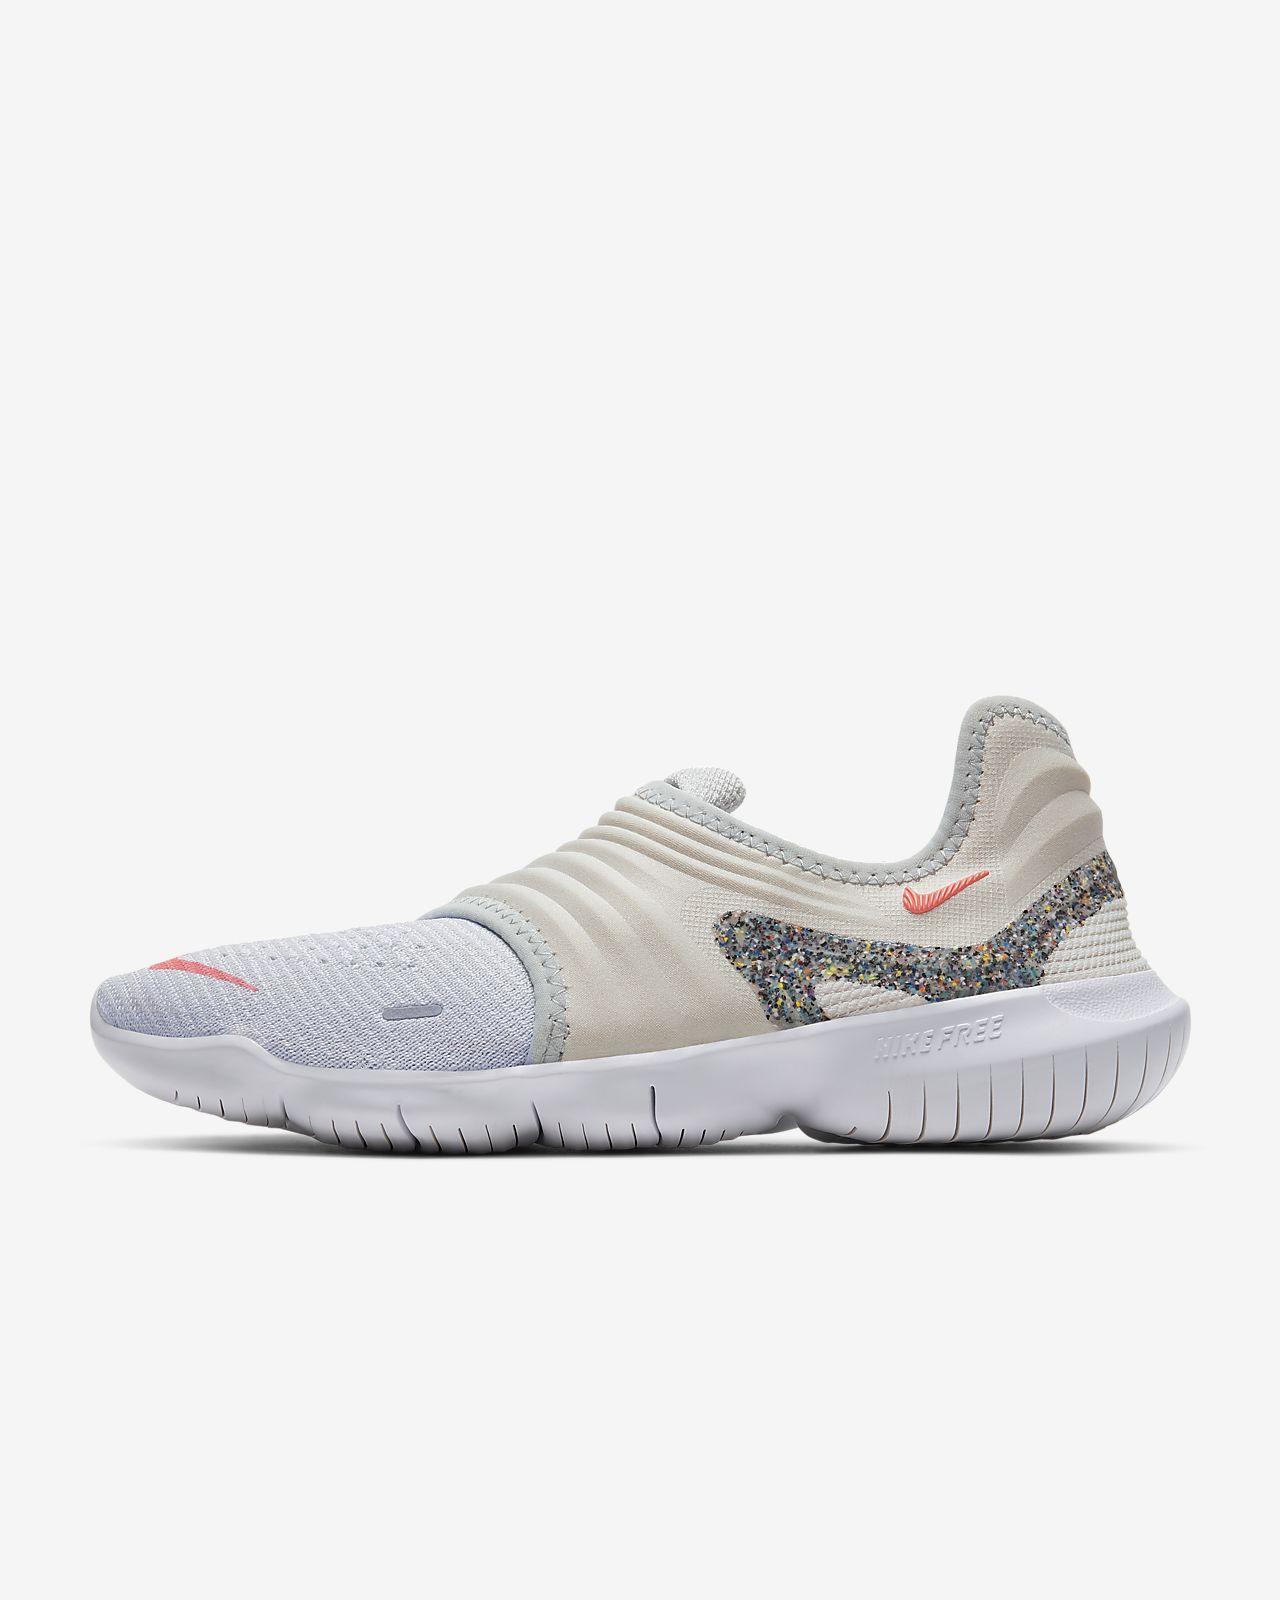 Nike Free Run 4.0 V2 Man nike free run 3.0 woman price, nike